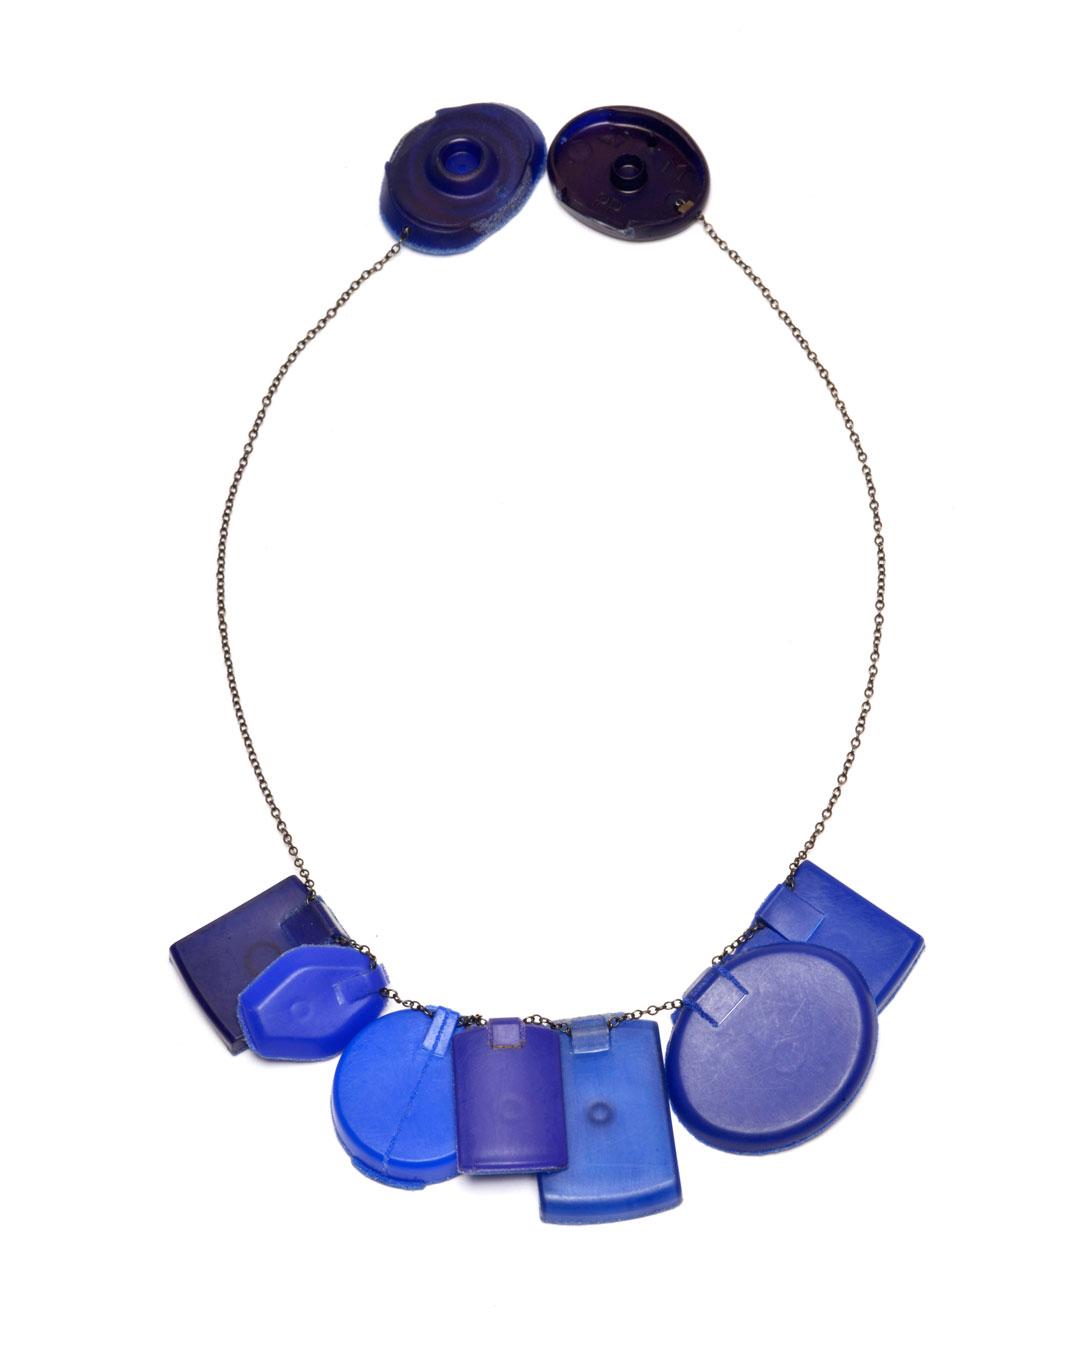 Ute Eitzenhöfer, Duschgelölmilchglanzshampooklarspülercollier, 2002, necklace; plastic (from packaging), silver, 230 x 120 x 10 mm, €950